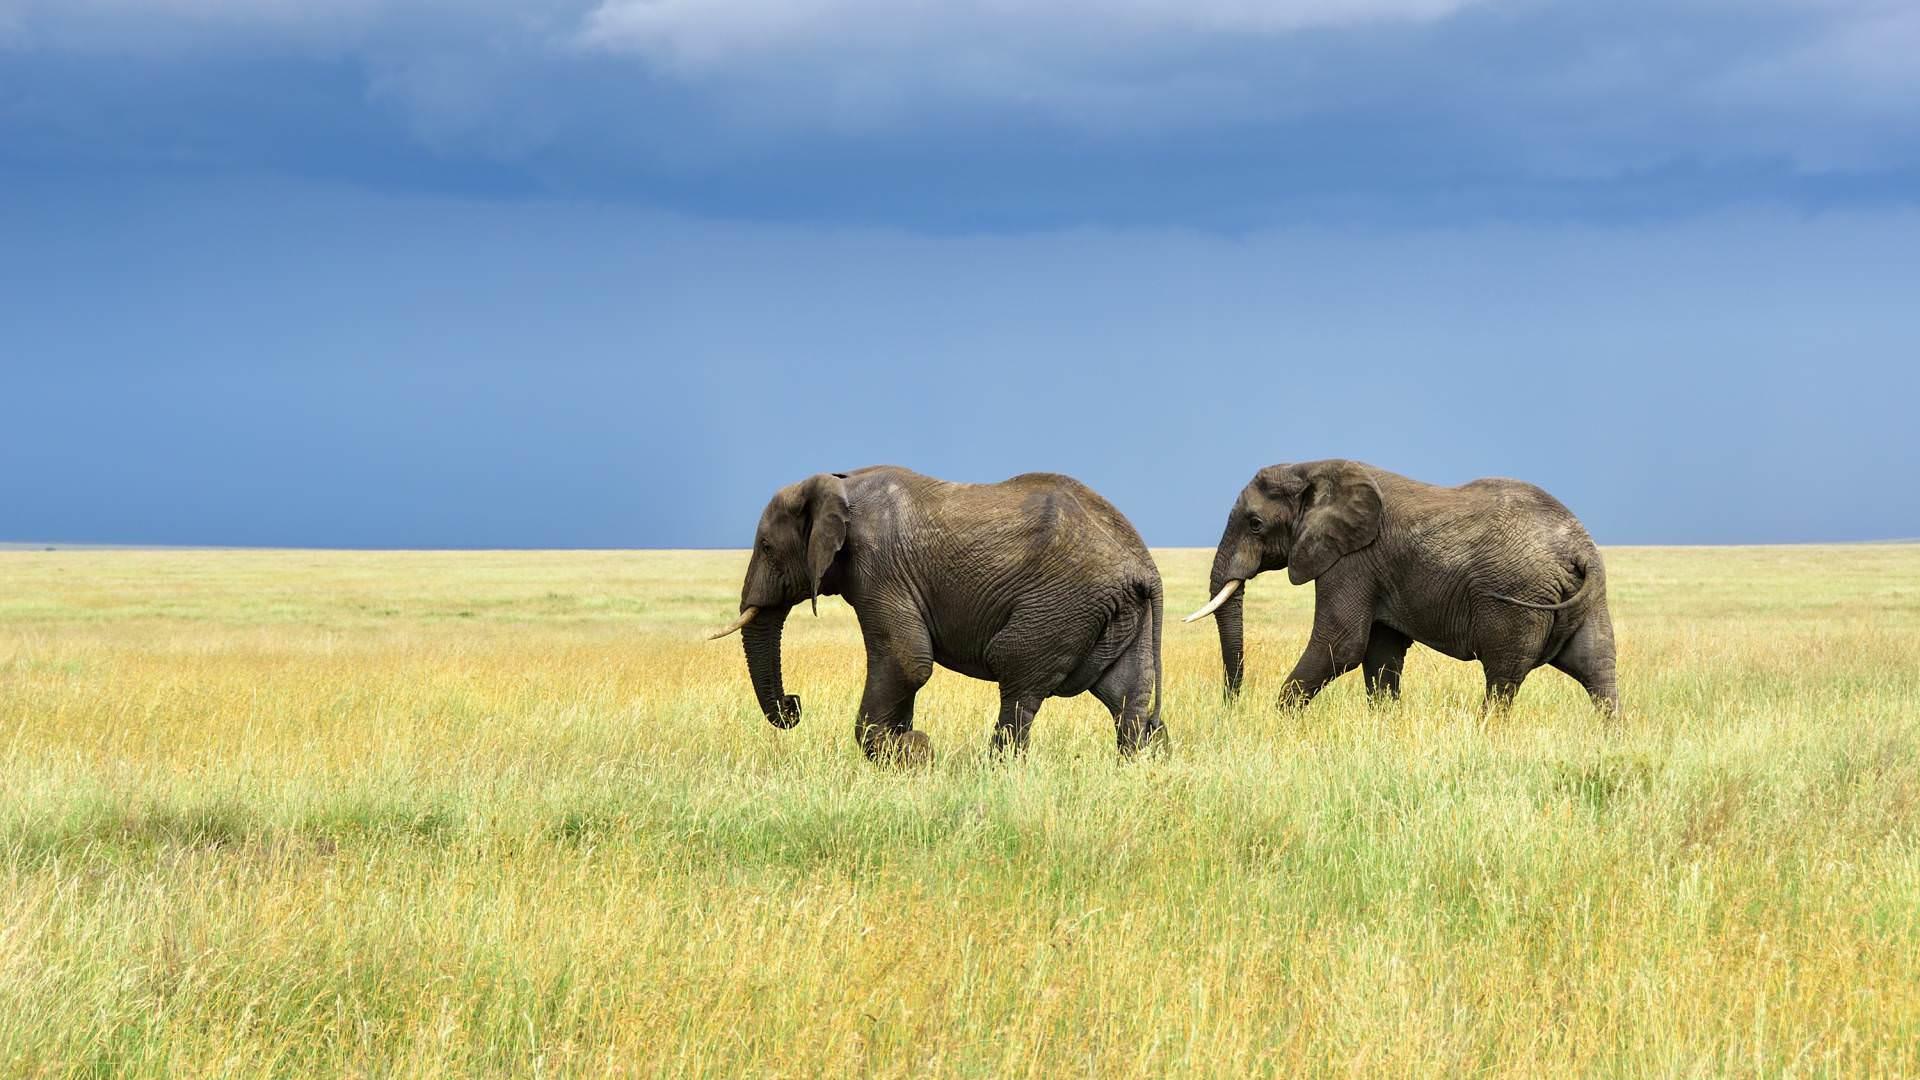 African elephants serengeti tanzania pintoafrica.com